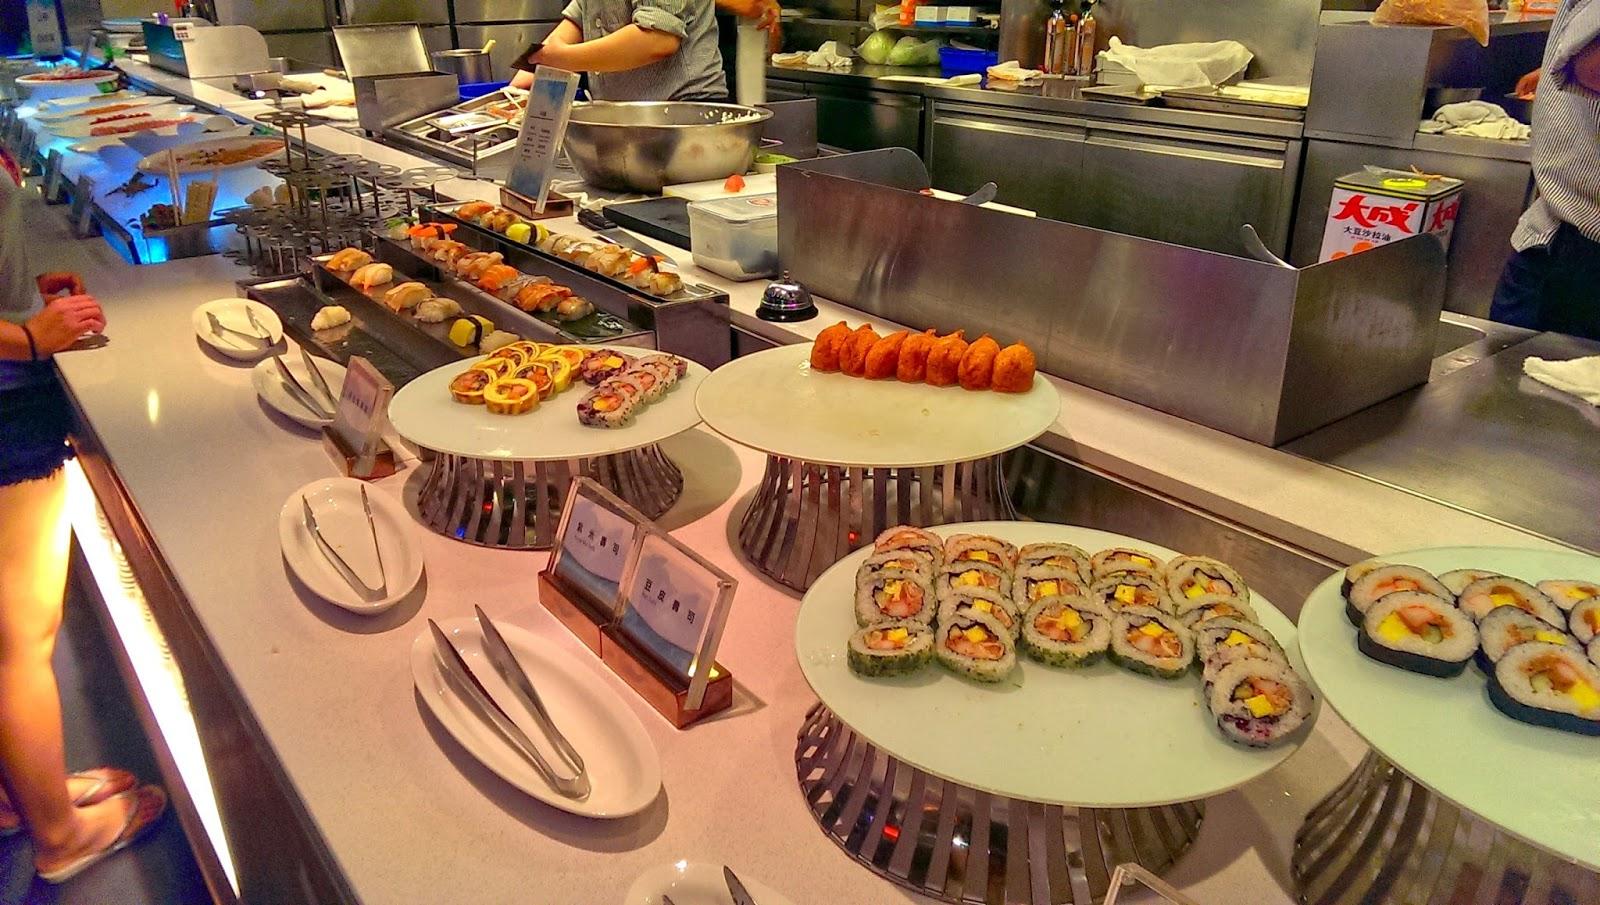 2015 07 01%2B19.15.13 - [食記] 台北京站 - 饗食天堂,有生魚片吃到飽的高級自助餐廳!